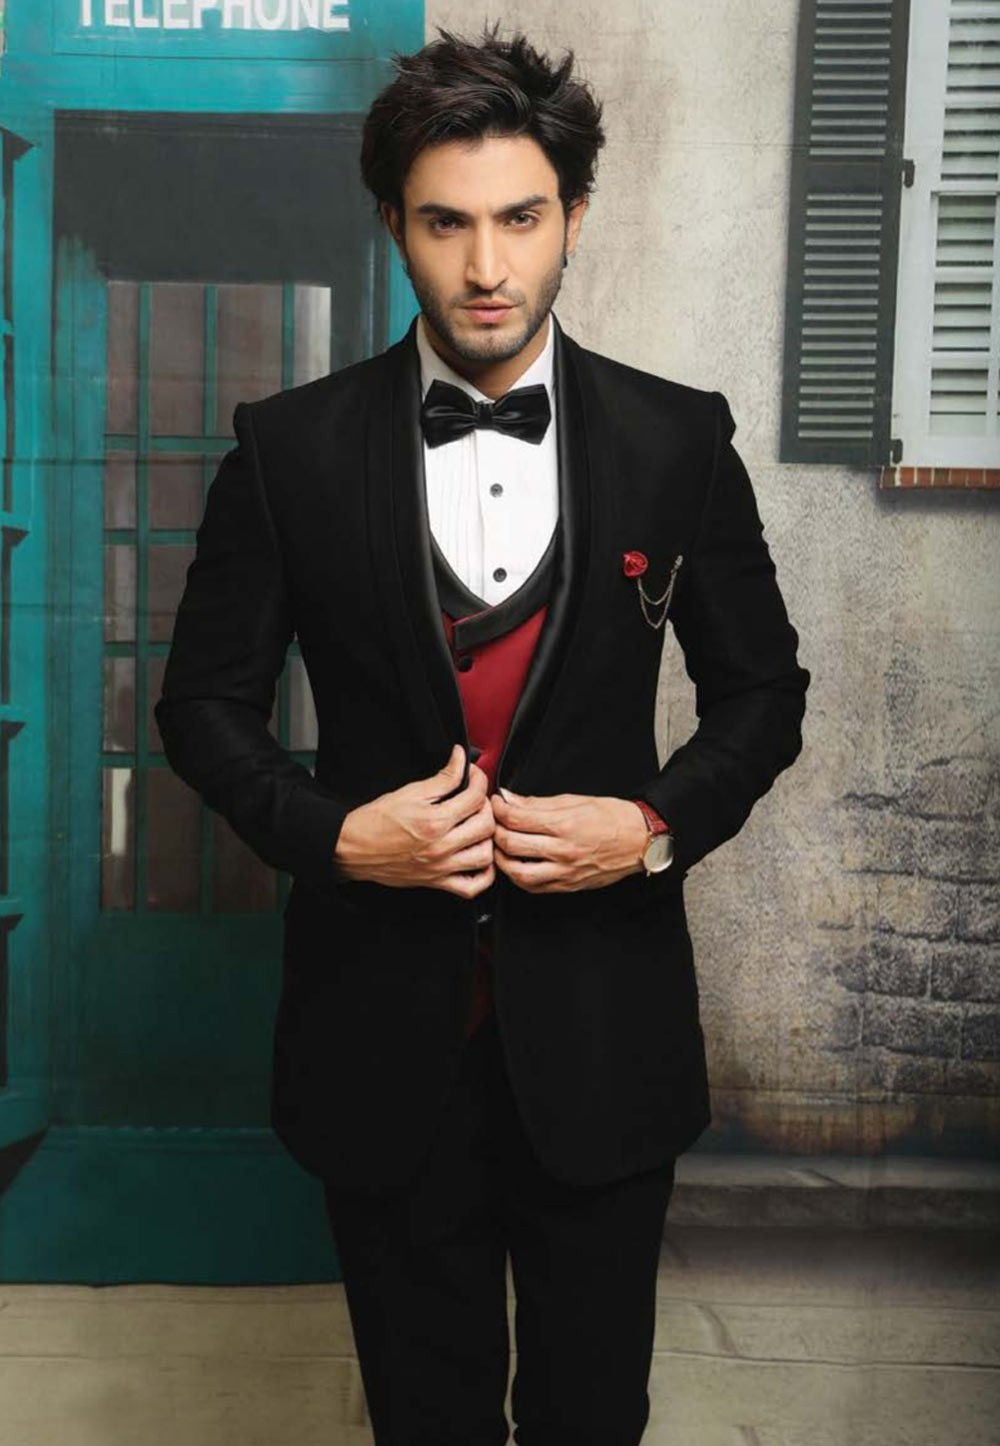 Best Wedding Suits for Men in Designer Tuxedo Suit with Italian Fabric